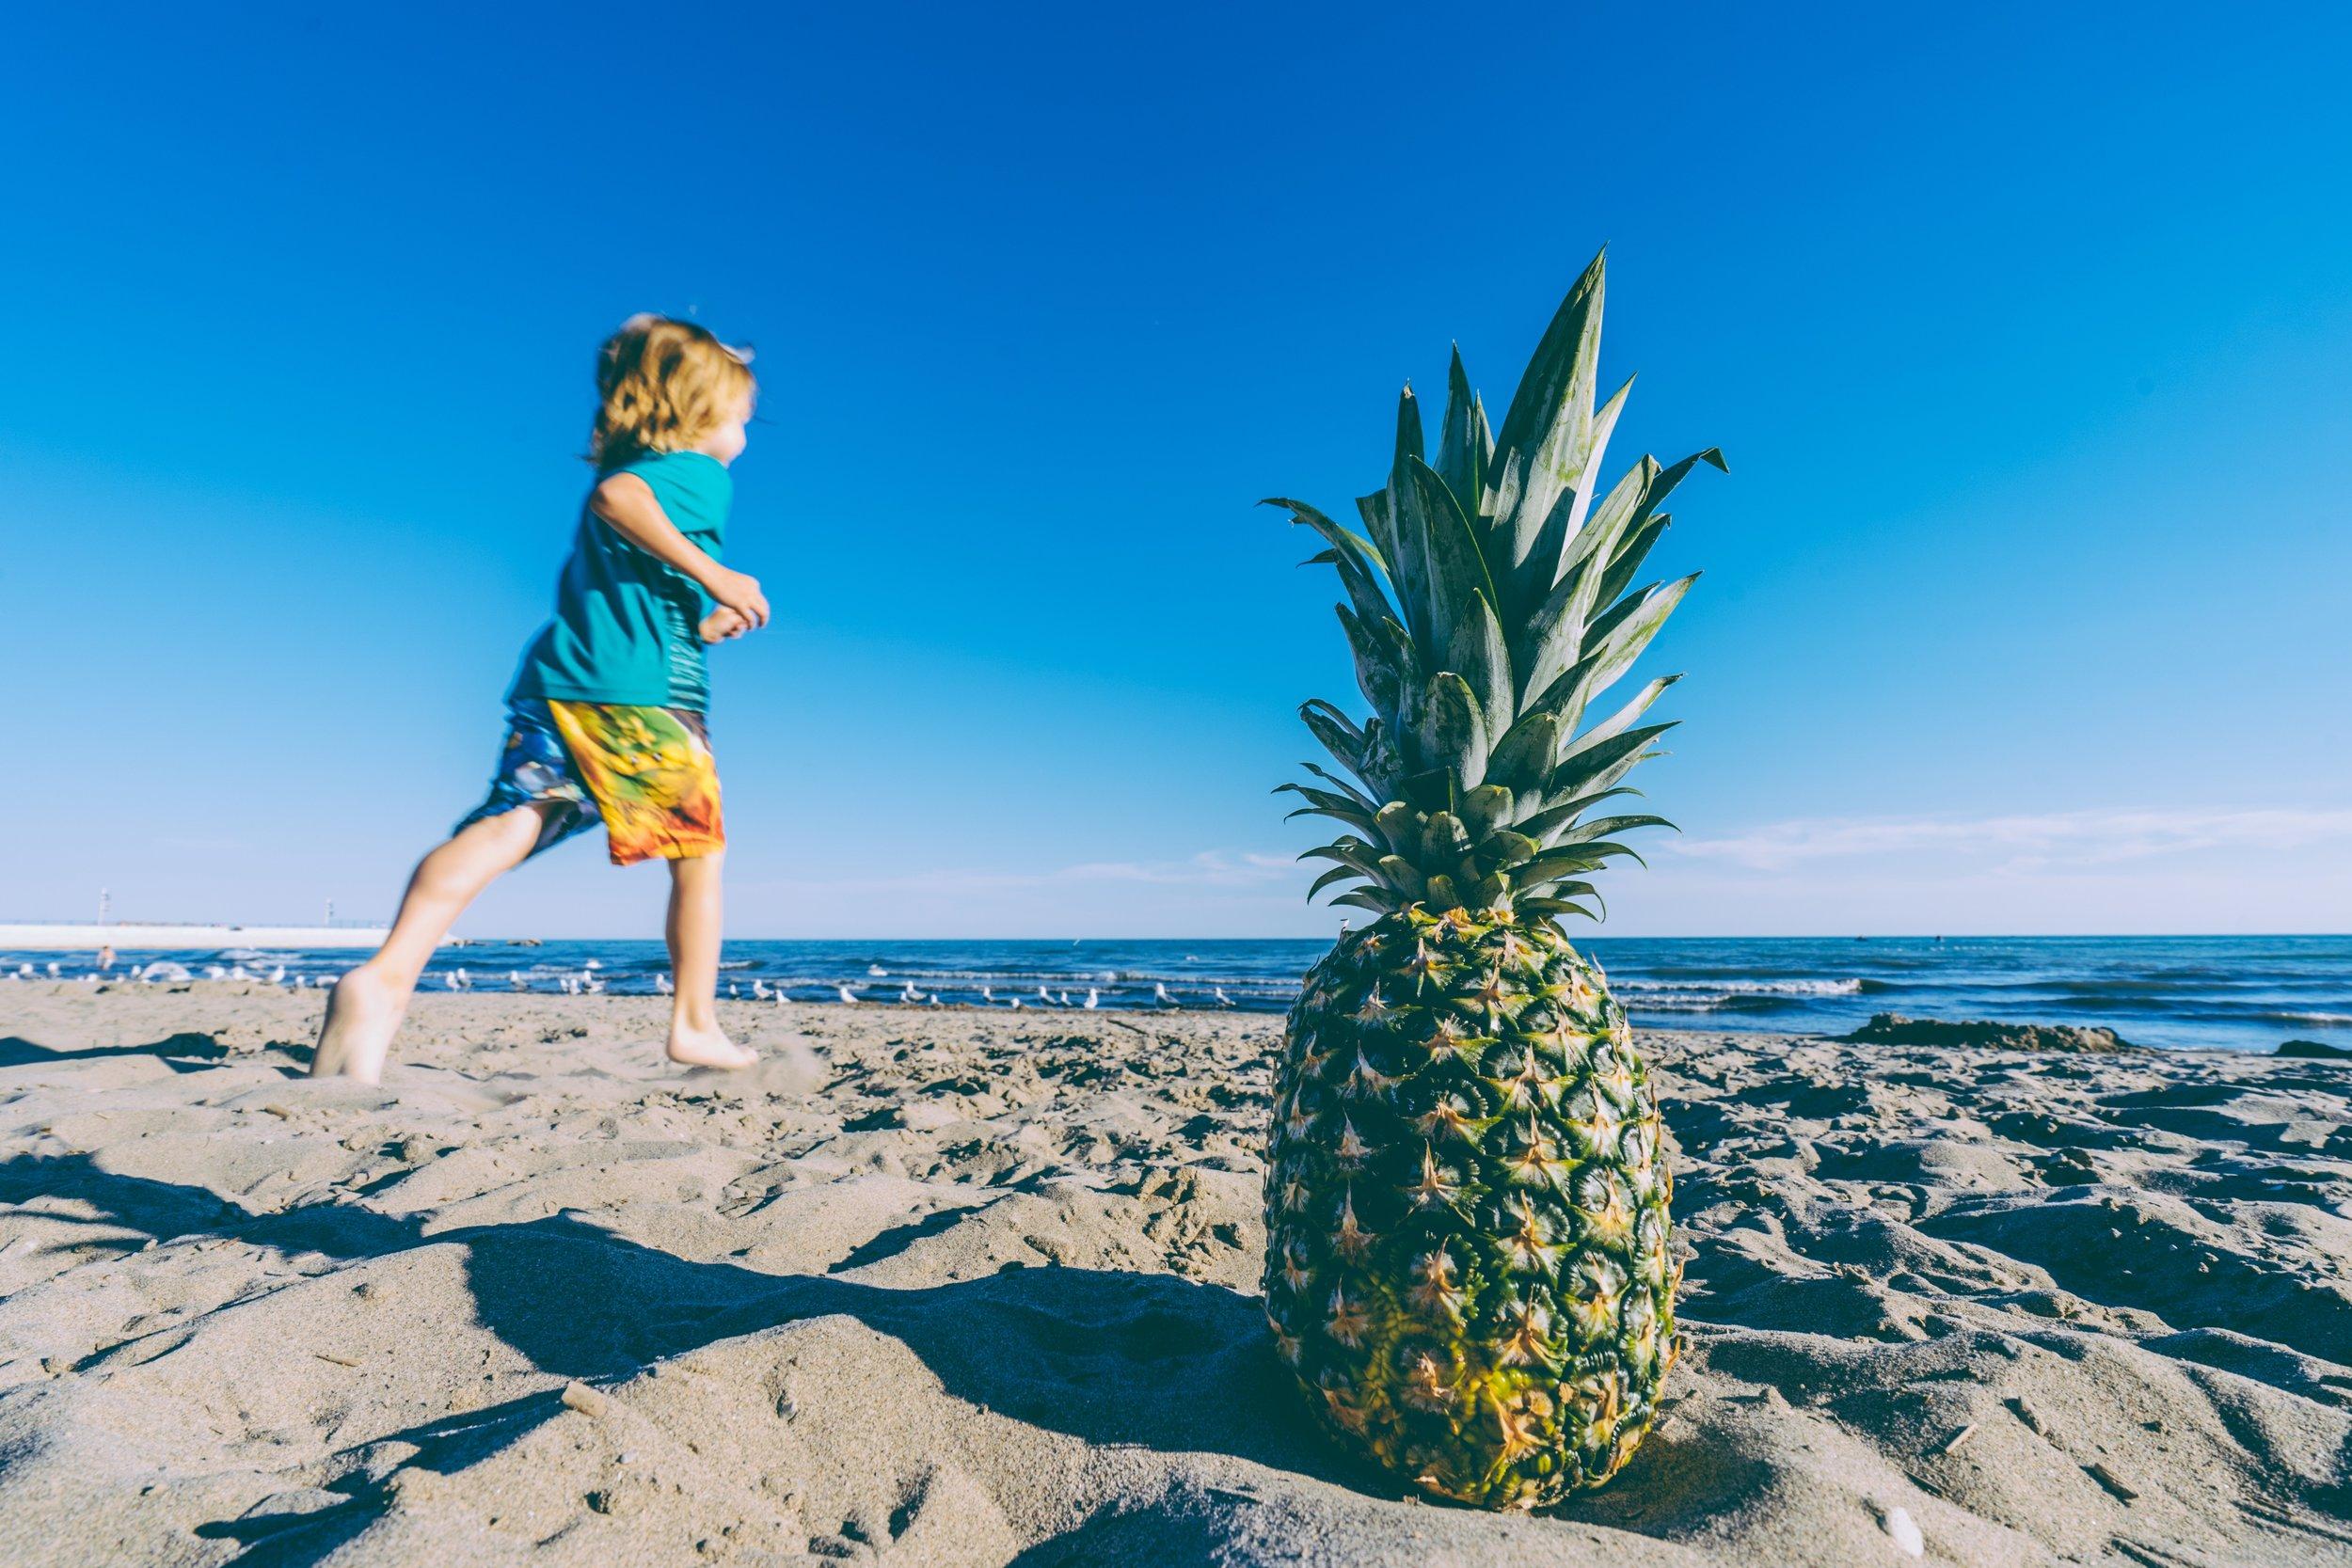 pineapple-supply-co-110191-unsplash.jpg